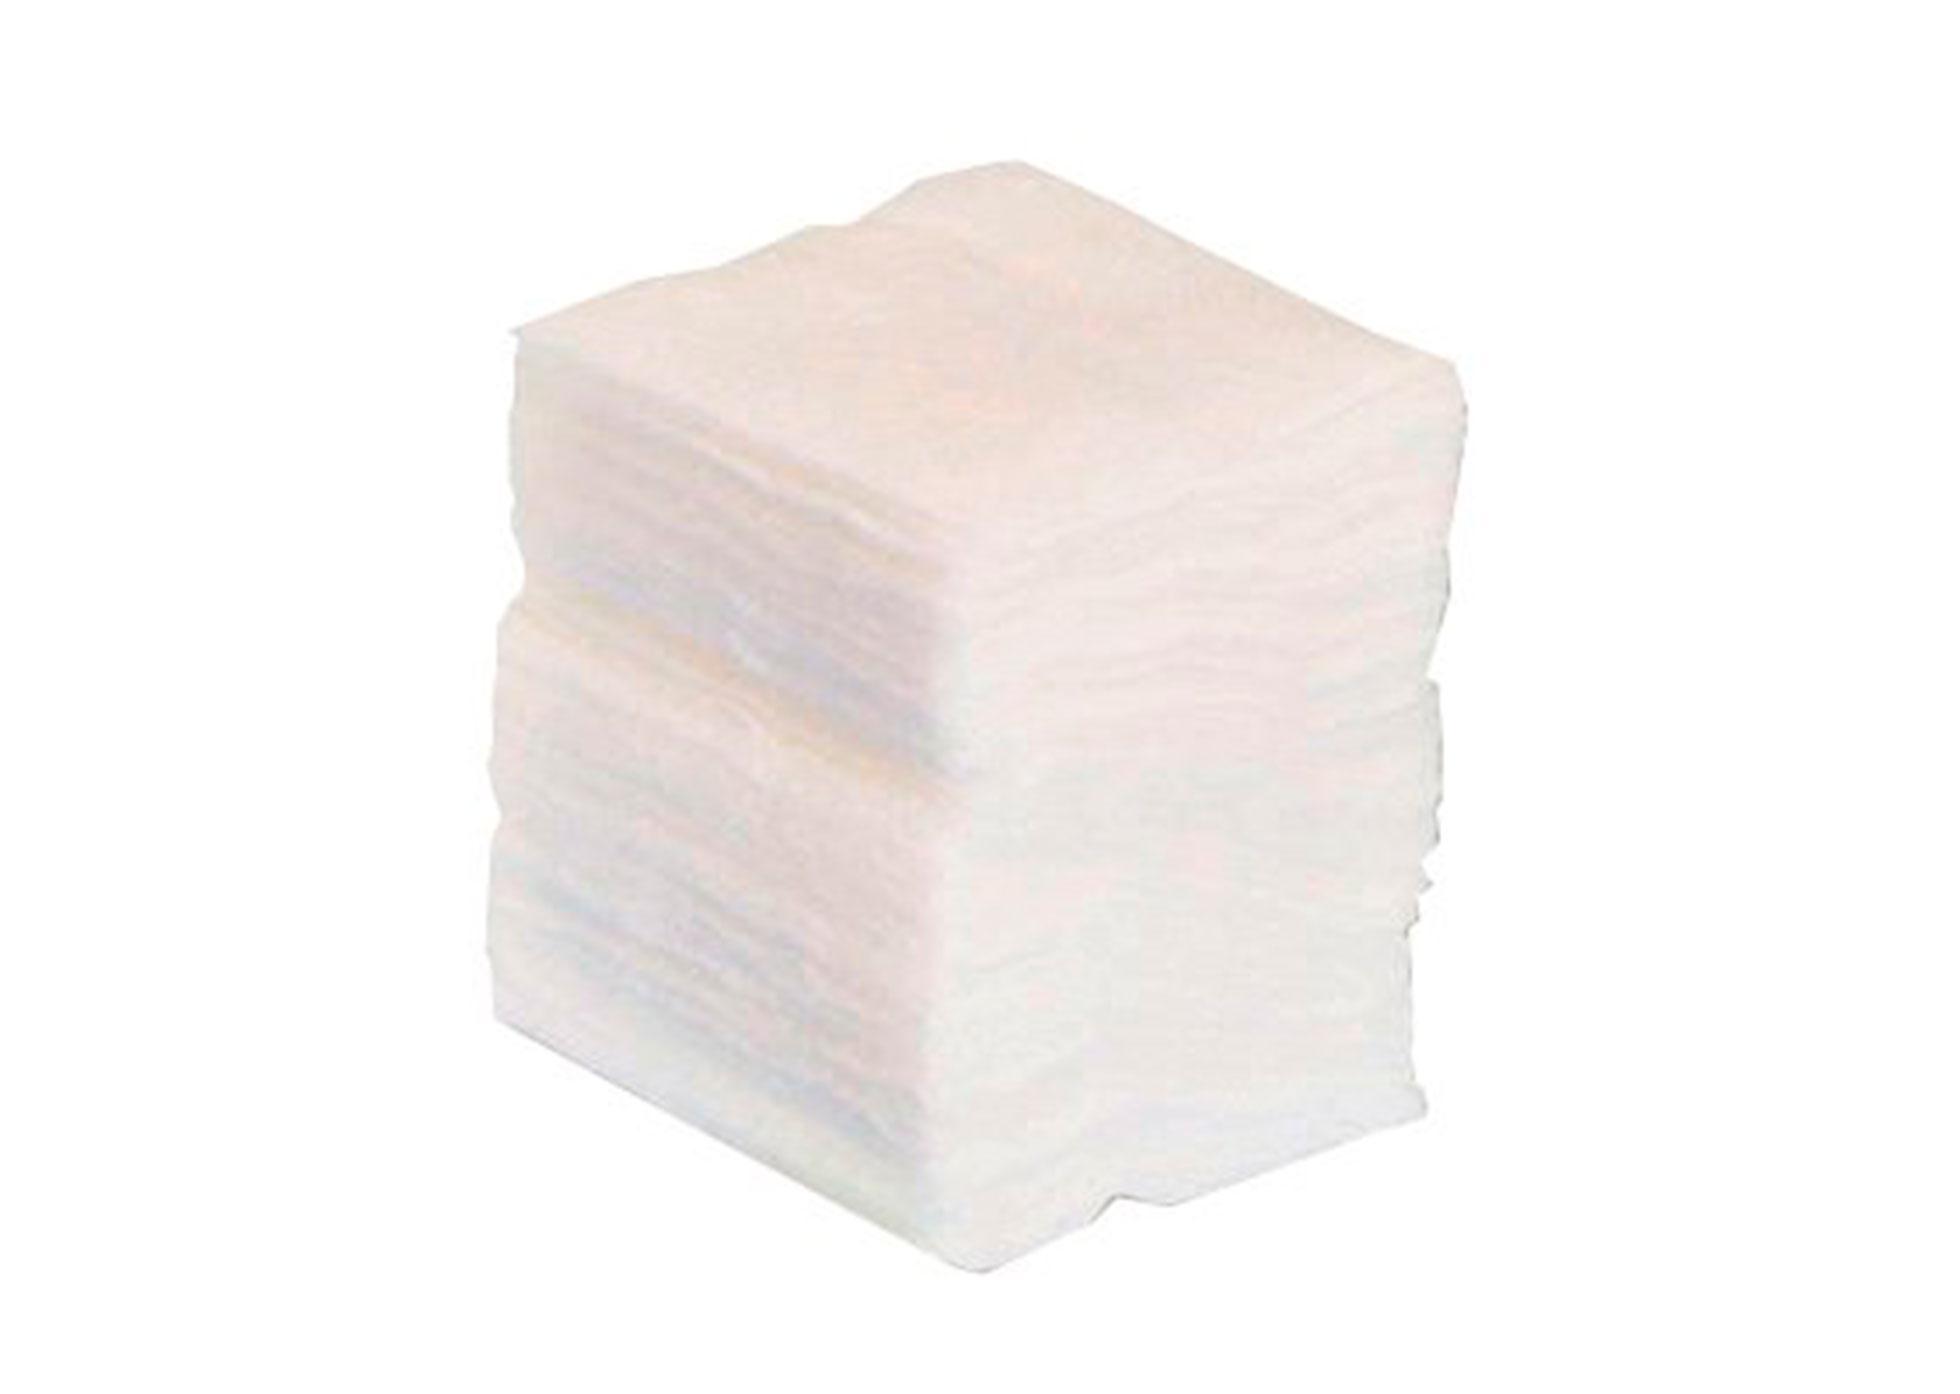 cotton-gauze-swabs.jpg